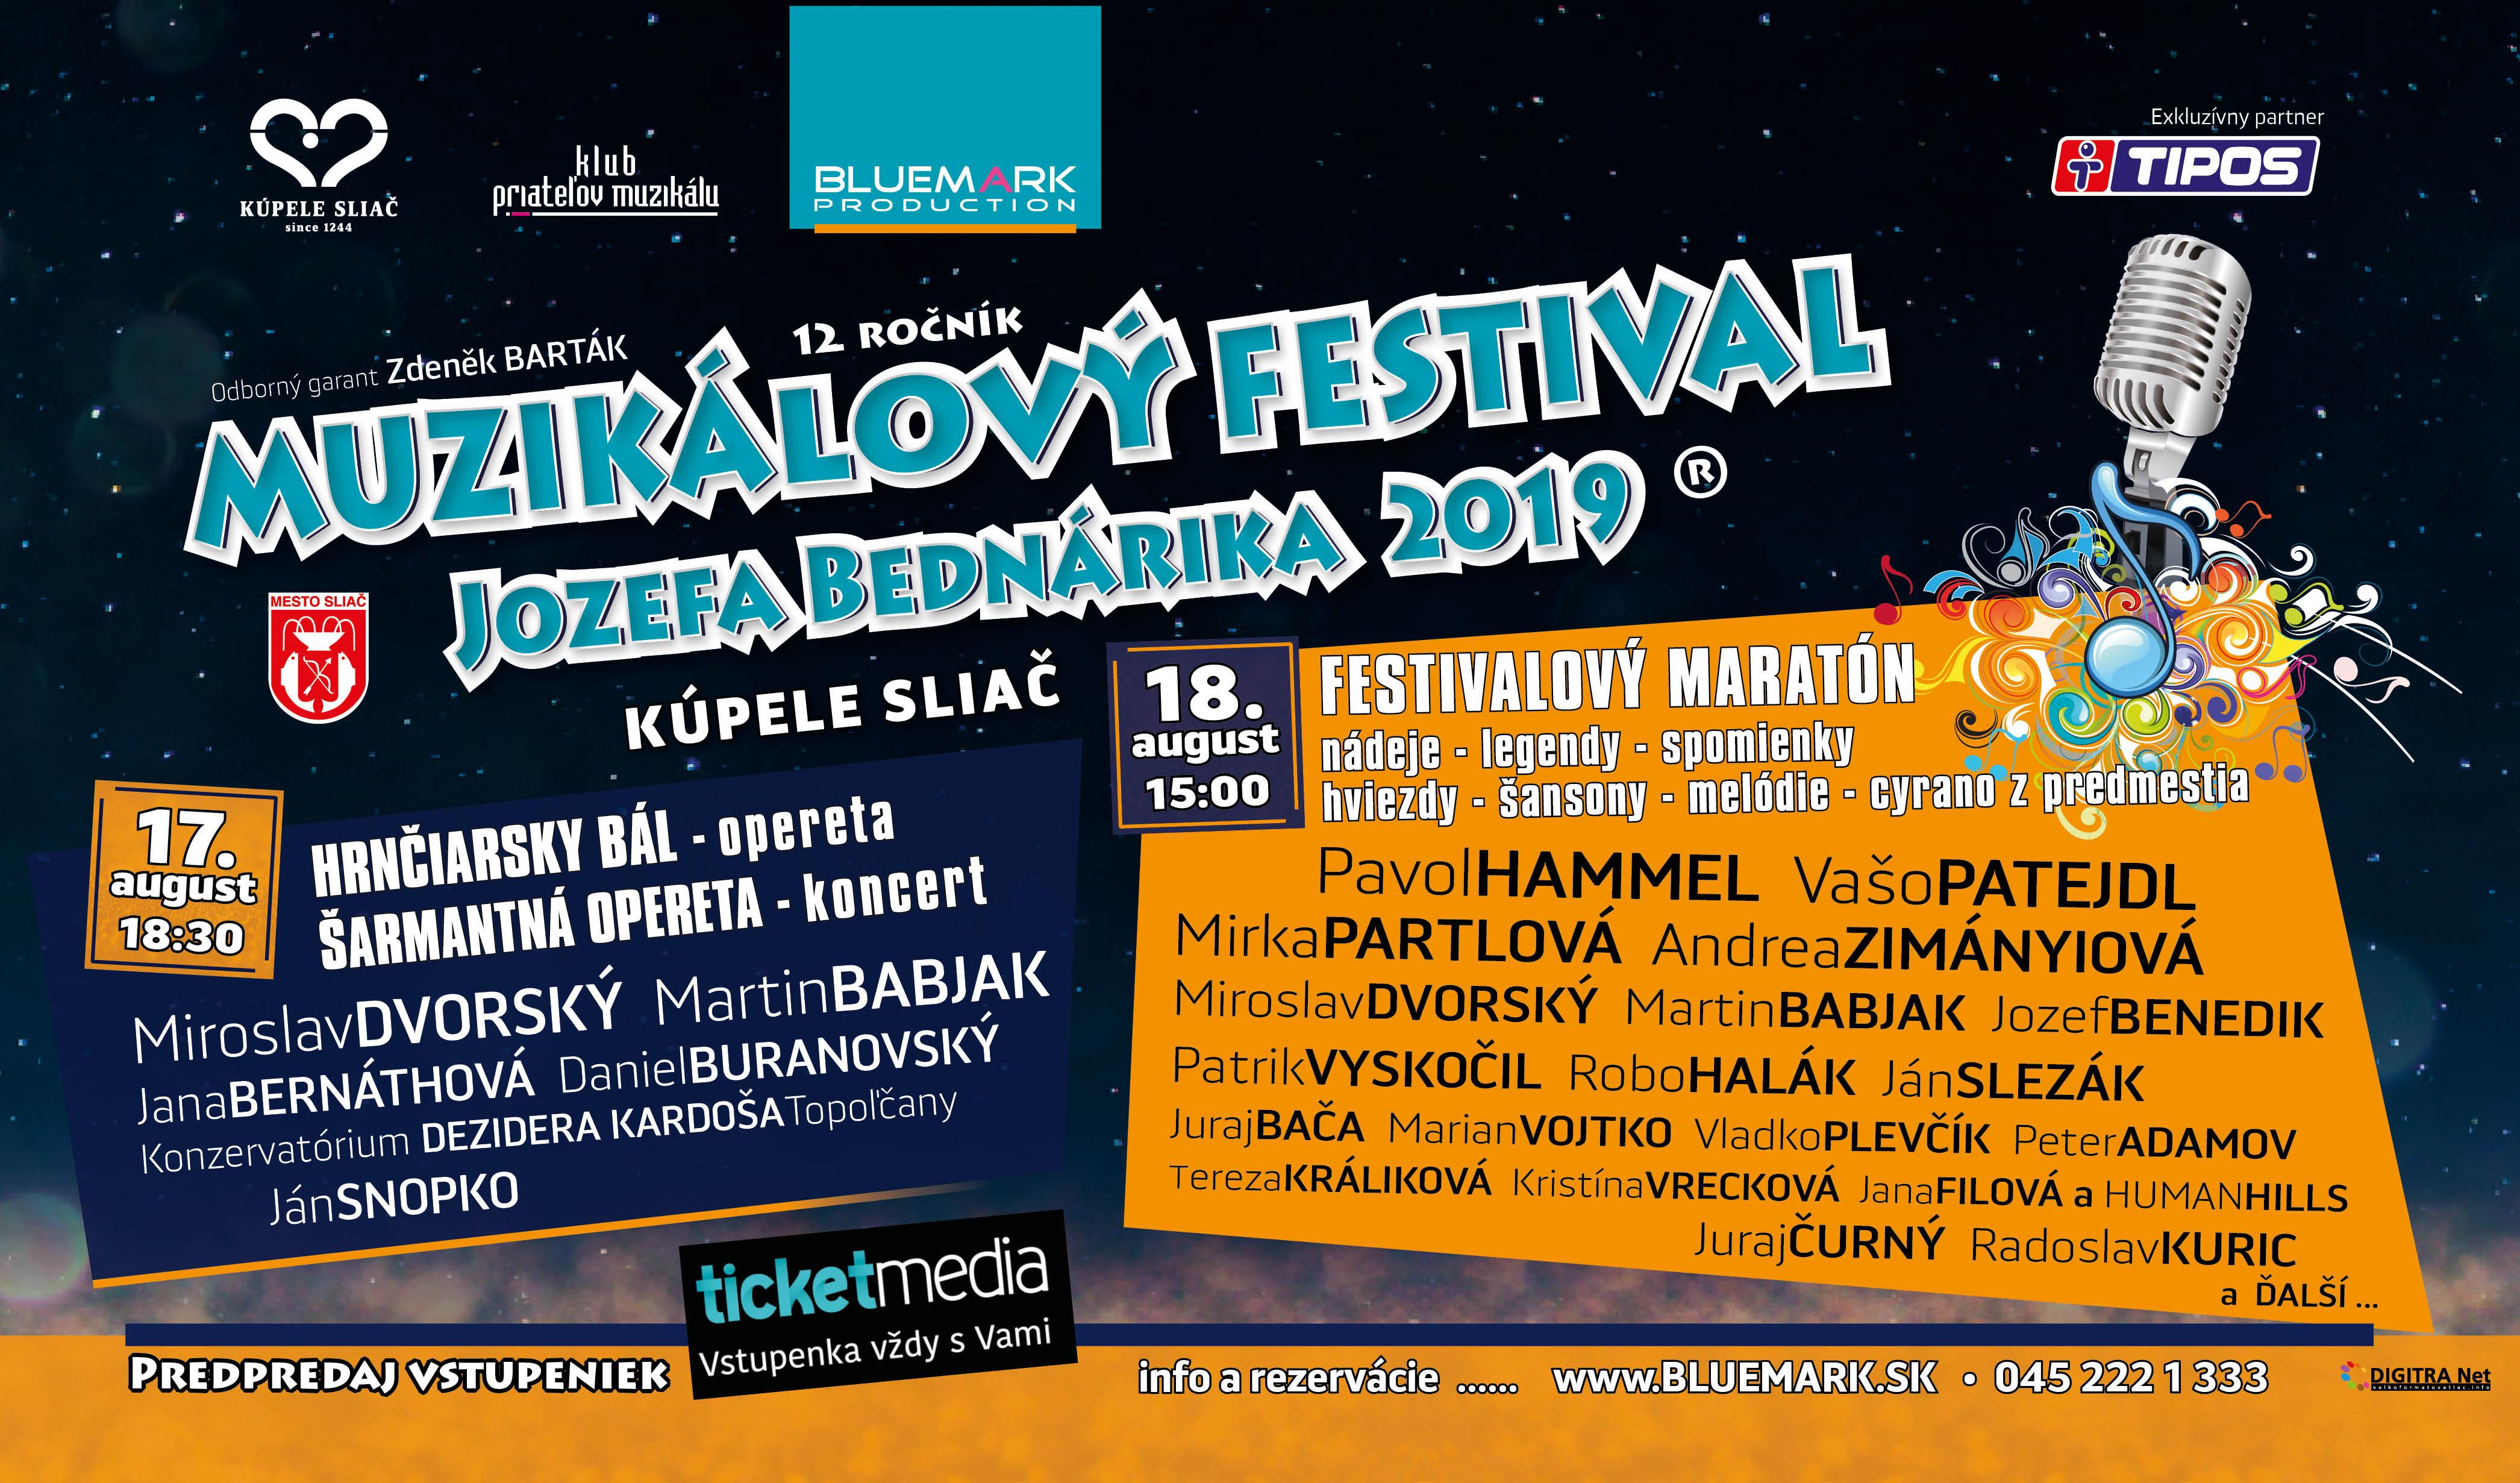 muzikalovy-festival-bednarika-plagat-sliac-5